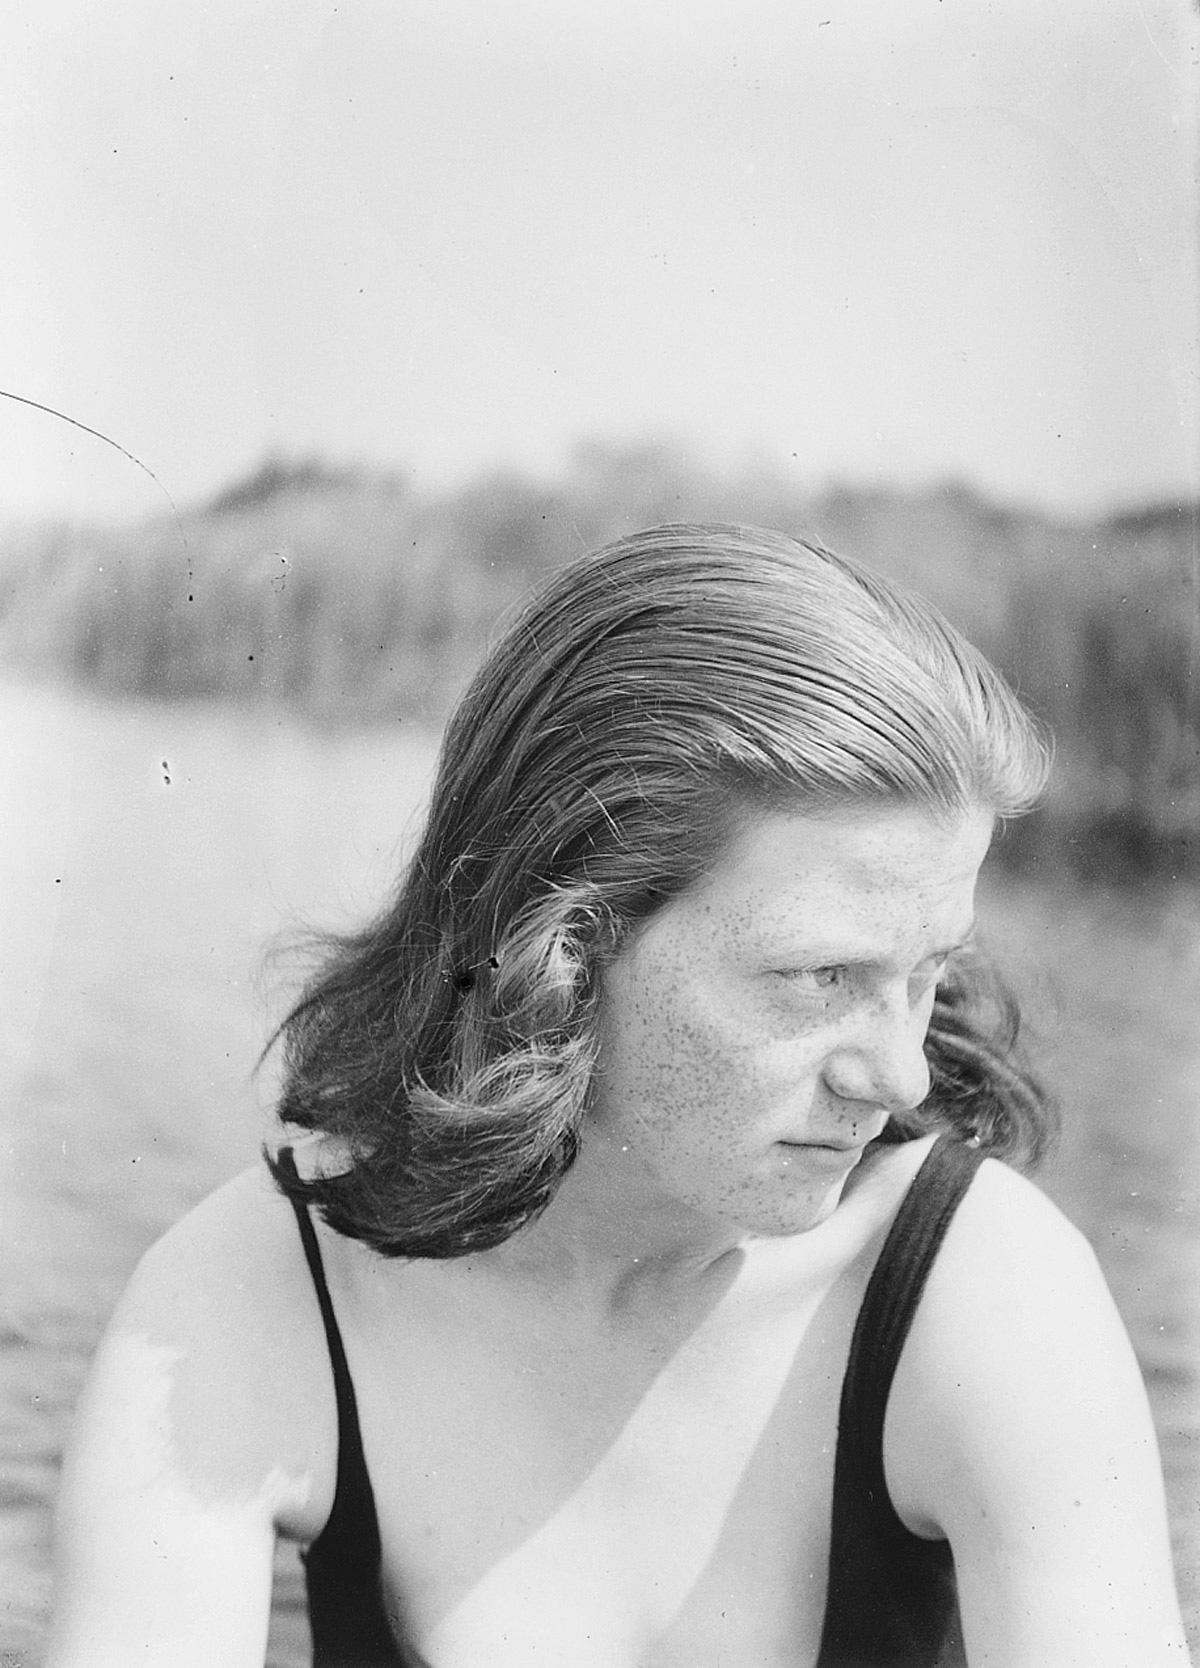 Melle schilder | Martha Bruijn, glasnegatief op fotopapier